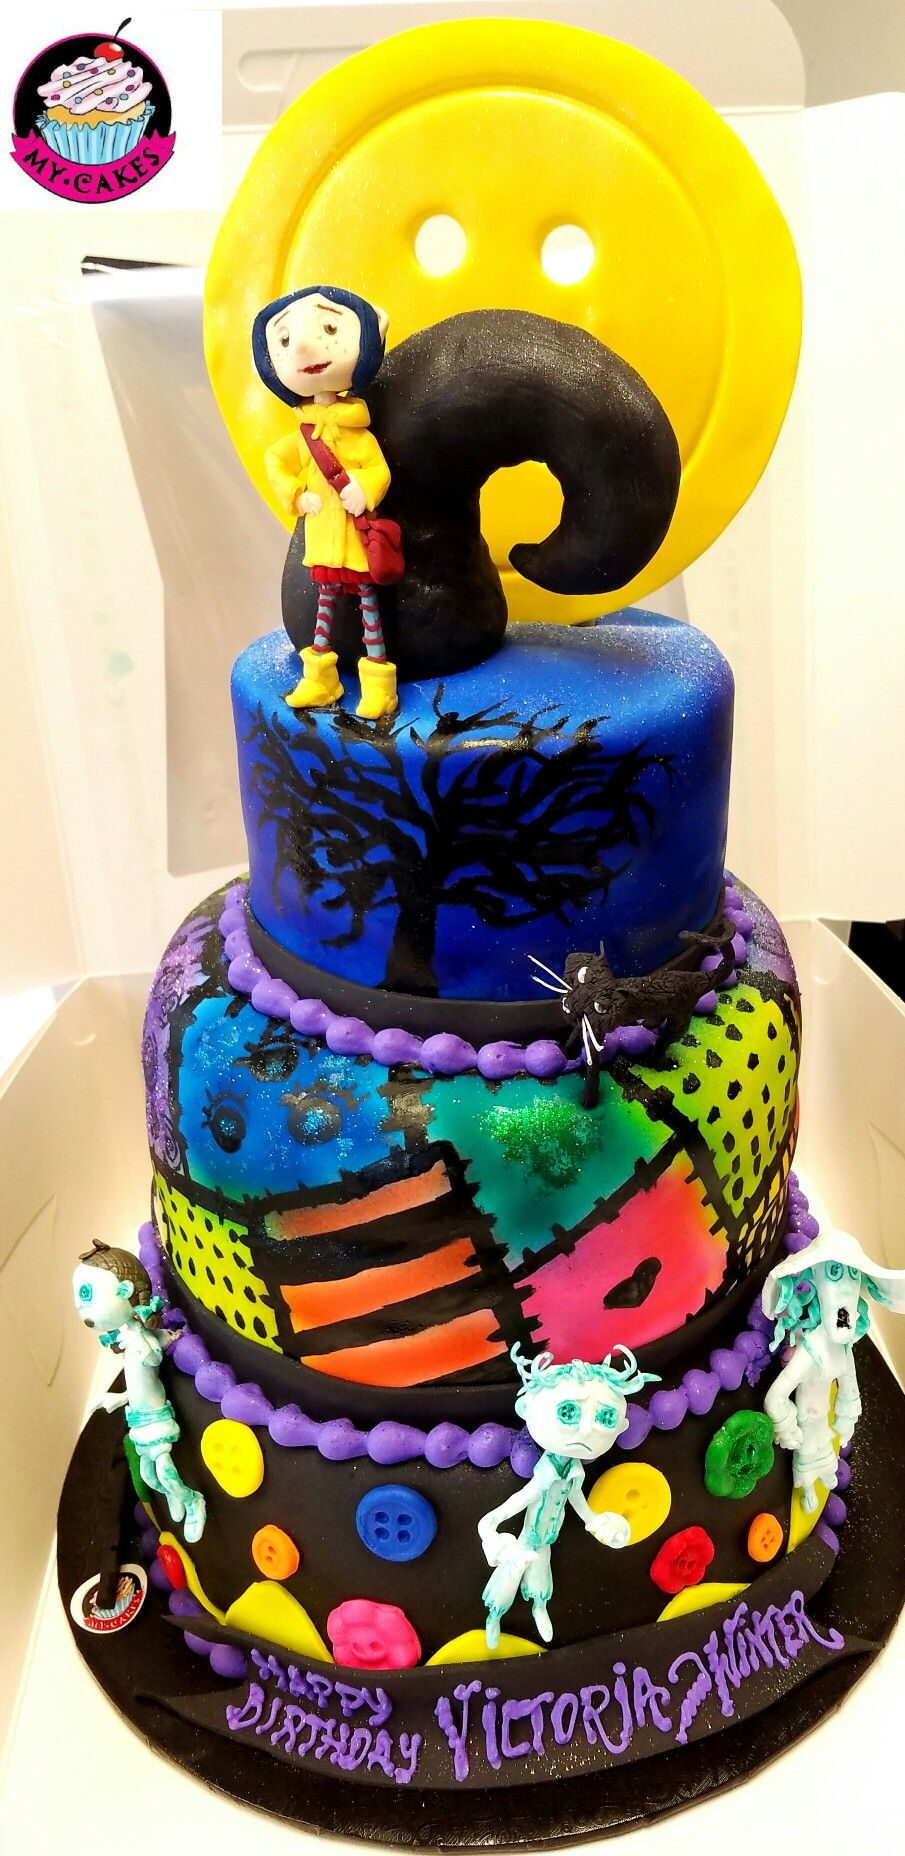 Marvelous Coraline Theme Cake With Images Birthday Cake Kids Coraline Funny Birthday Cards Online Inifodamsfinfo